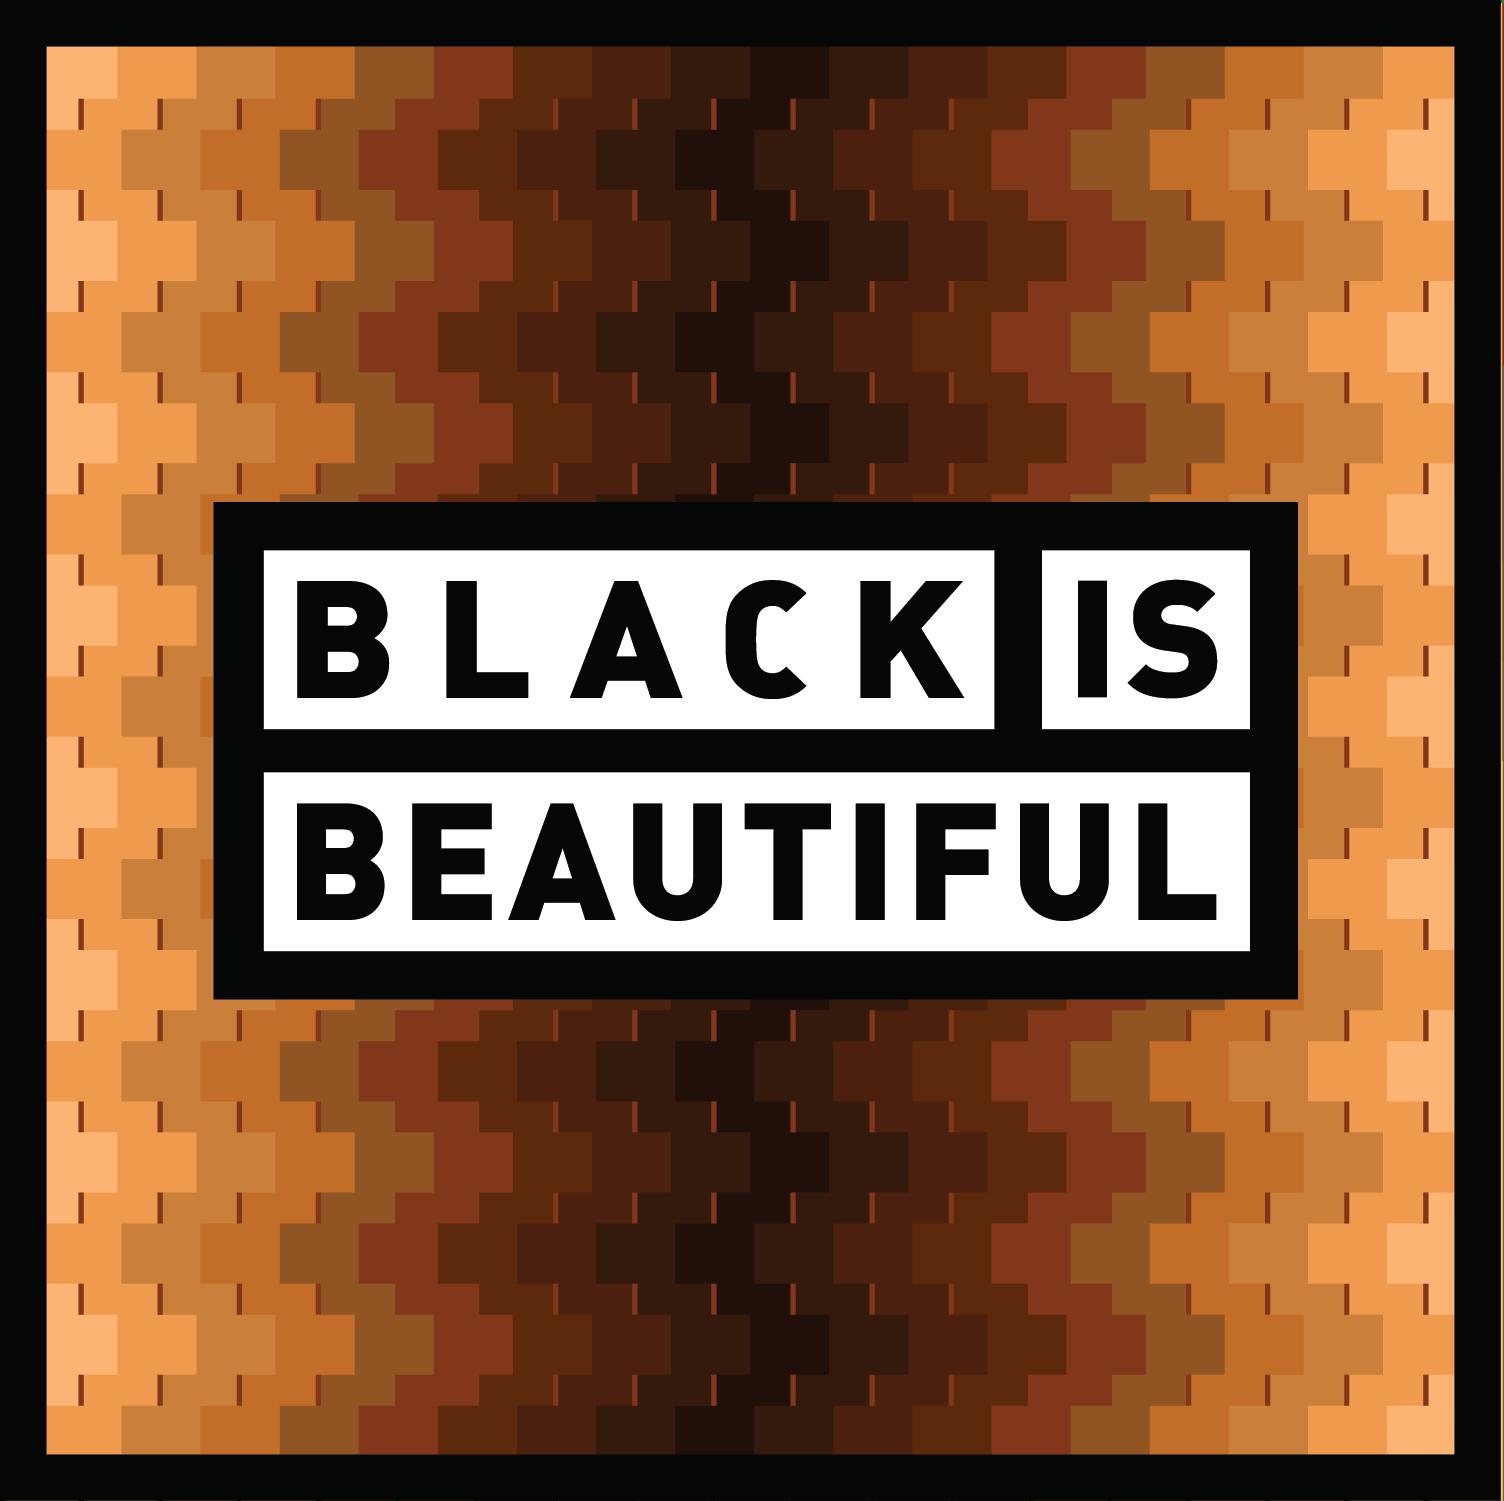 Giant Jones Black is Beautiful